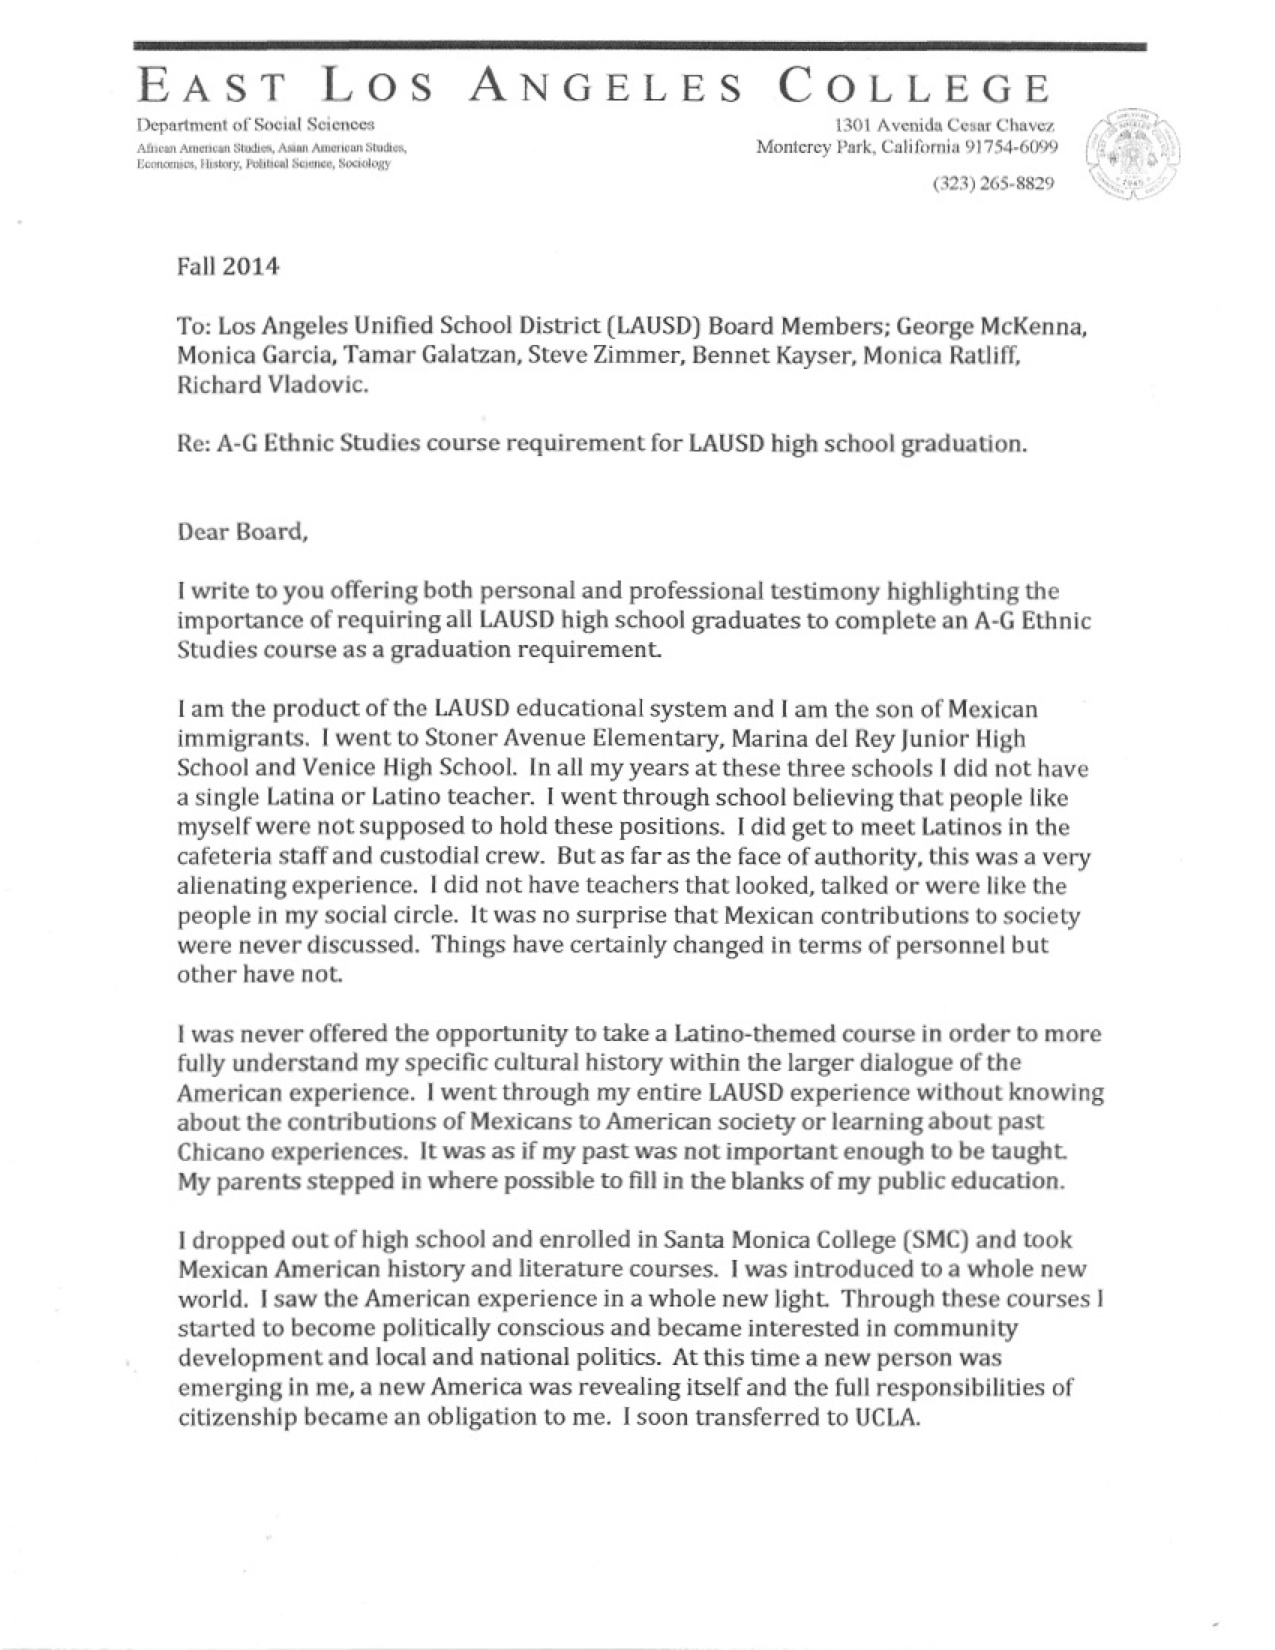 Letter_to_Board_ELAC_Prof_Leonard_Melchor_p1.jpg